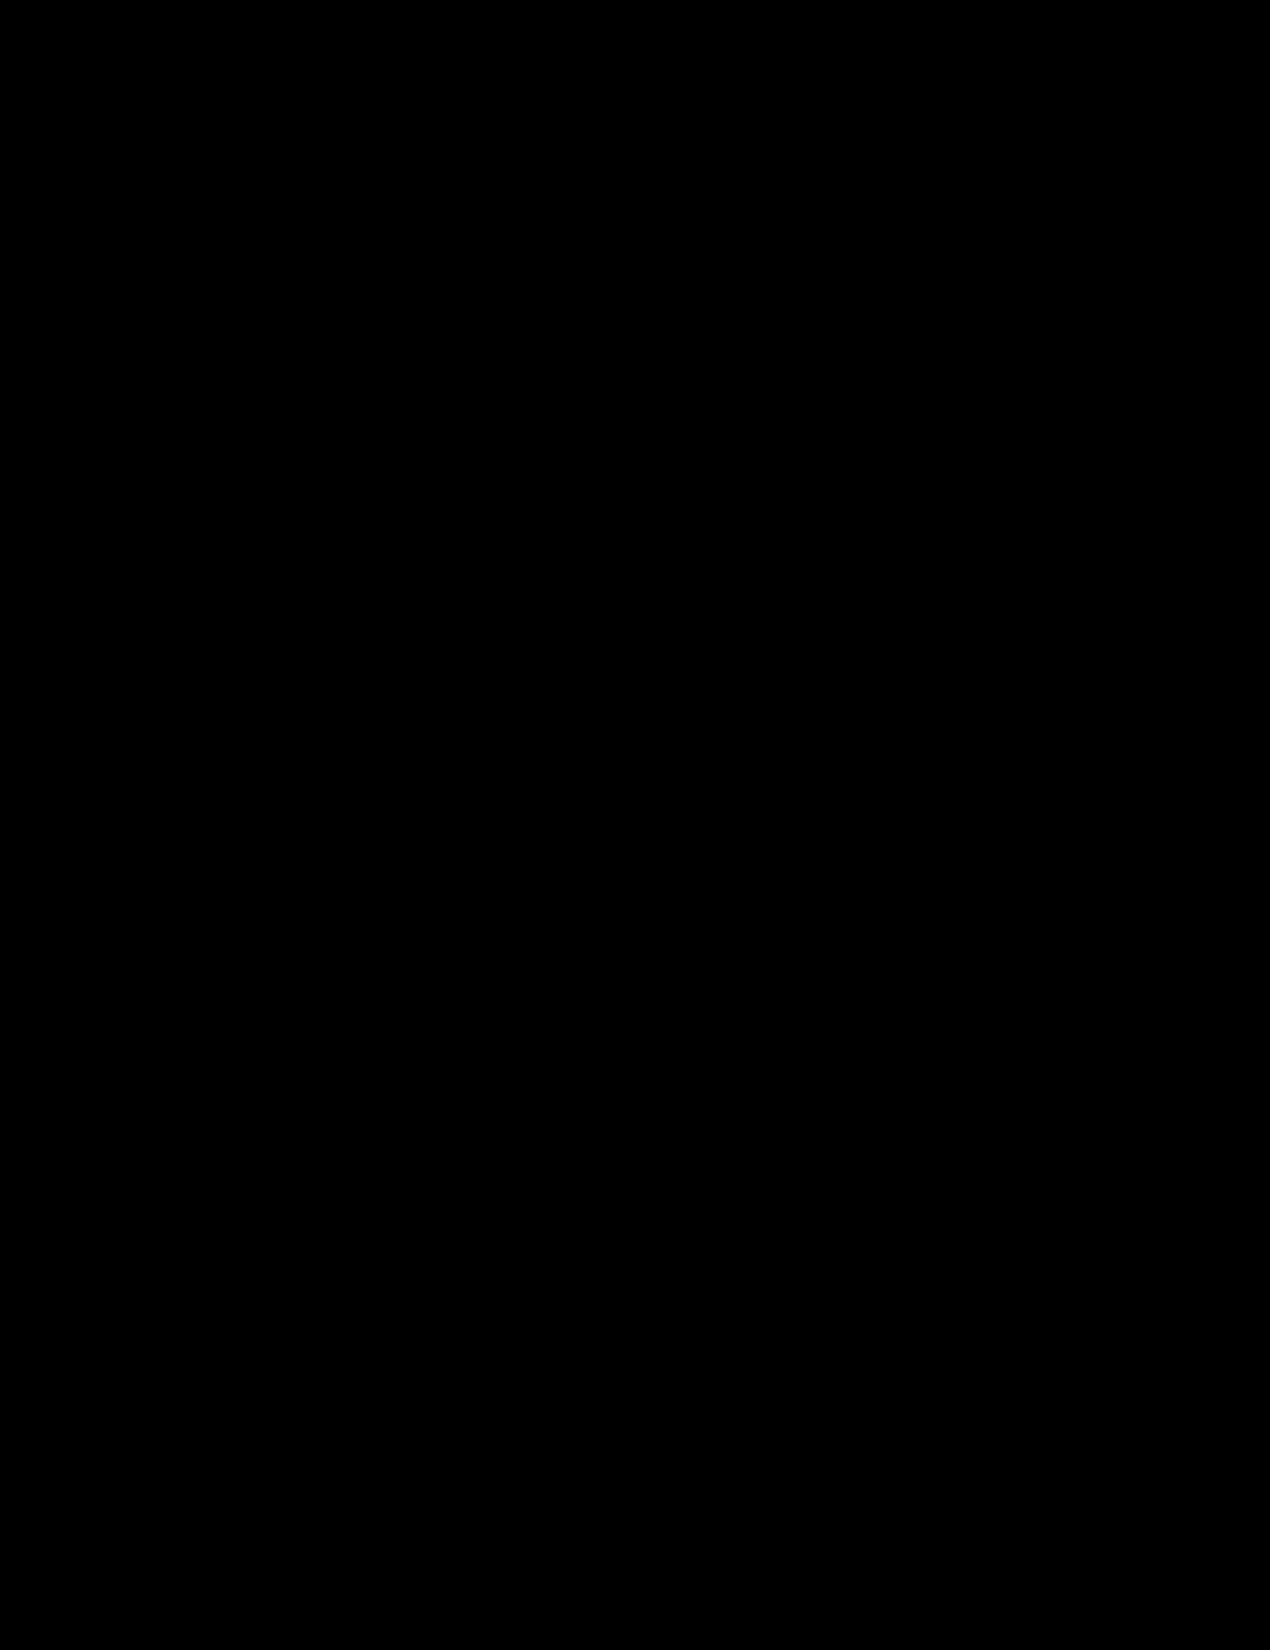 letter of advice com 200 interpersonal communication View notes - com200 interpersonal communication from com/200 200 at ashford university running head: letter of advice letter of advice misty richards com 200 interpersonal communication instructor:.